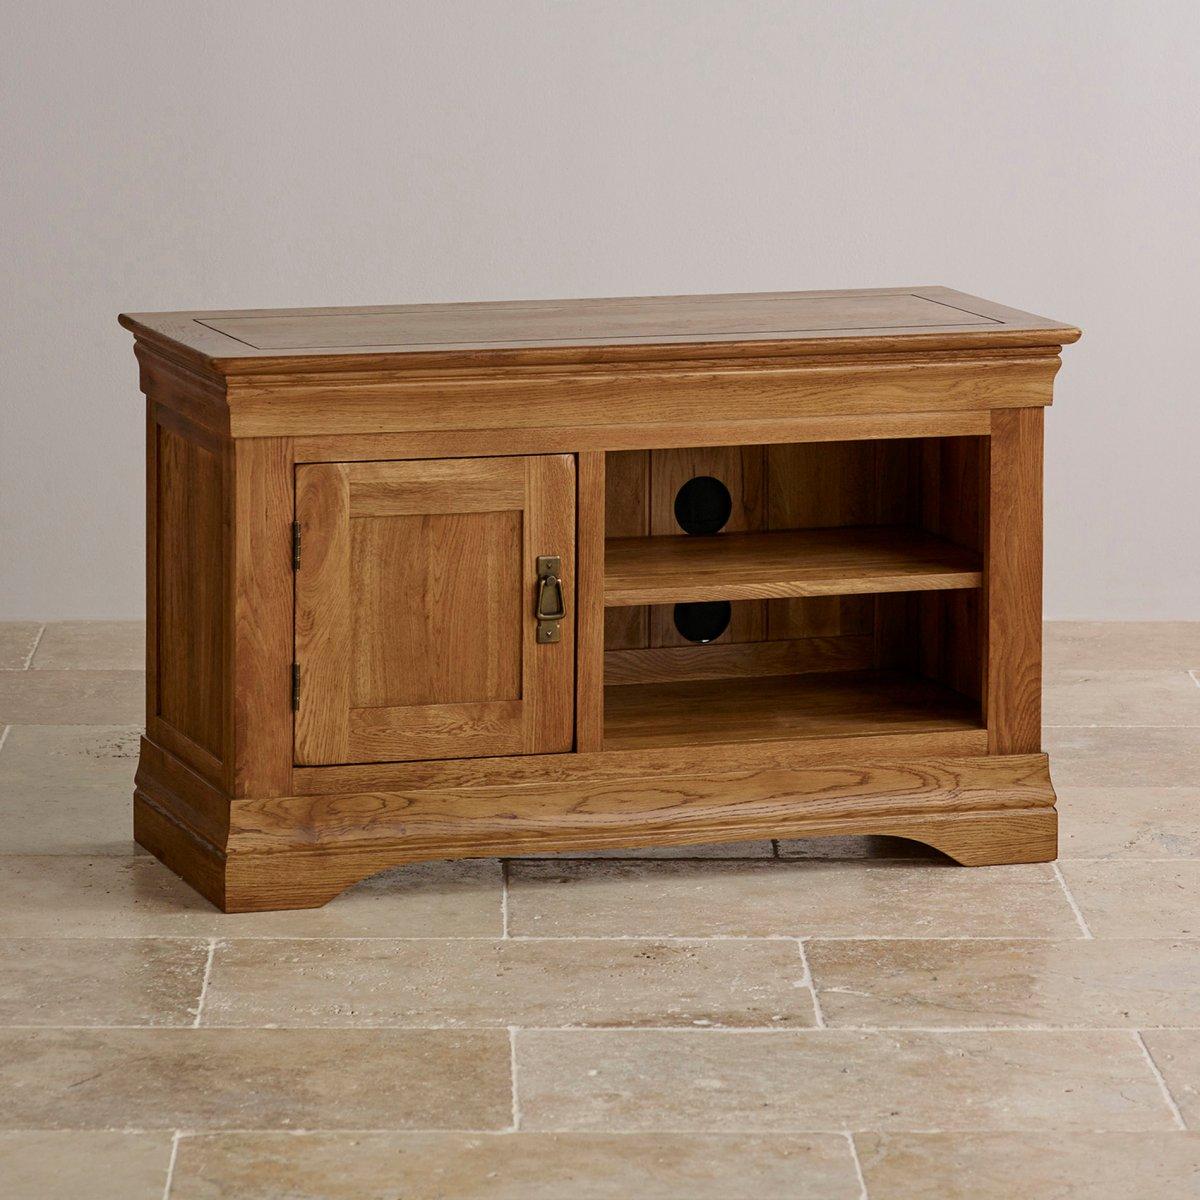 French Farmhouse Tv Cabinet Solid Oak Oak Furniture Land